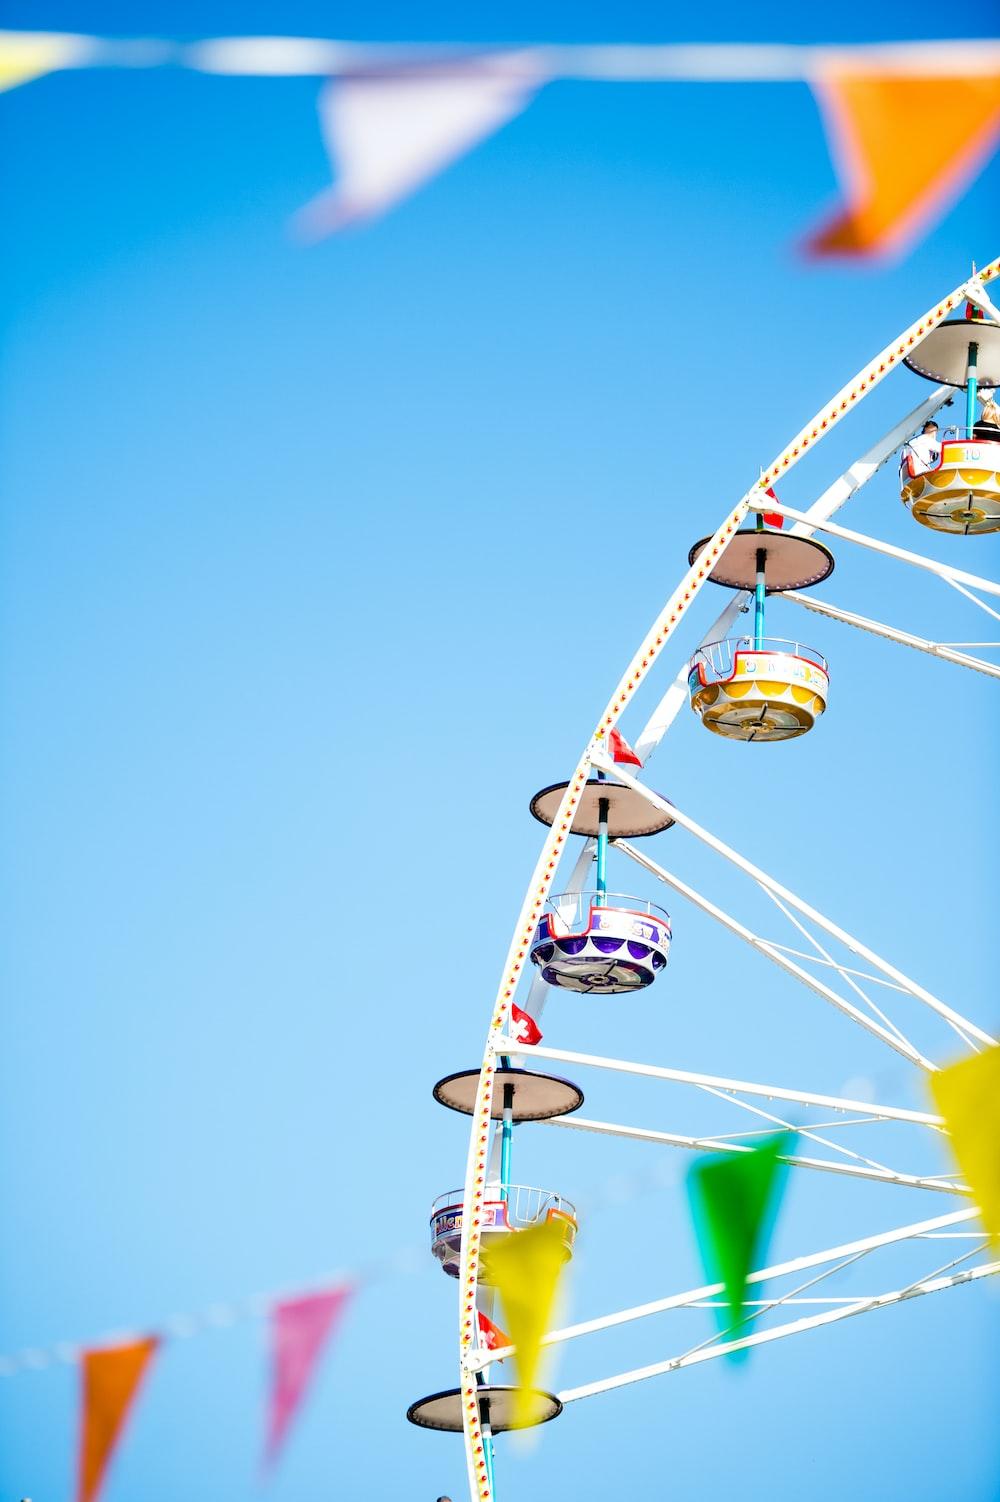 white and yellow Ferris wheel under blue skies photo